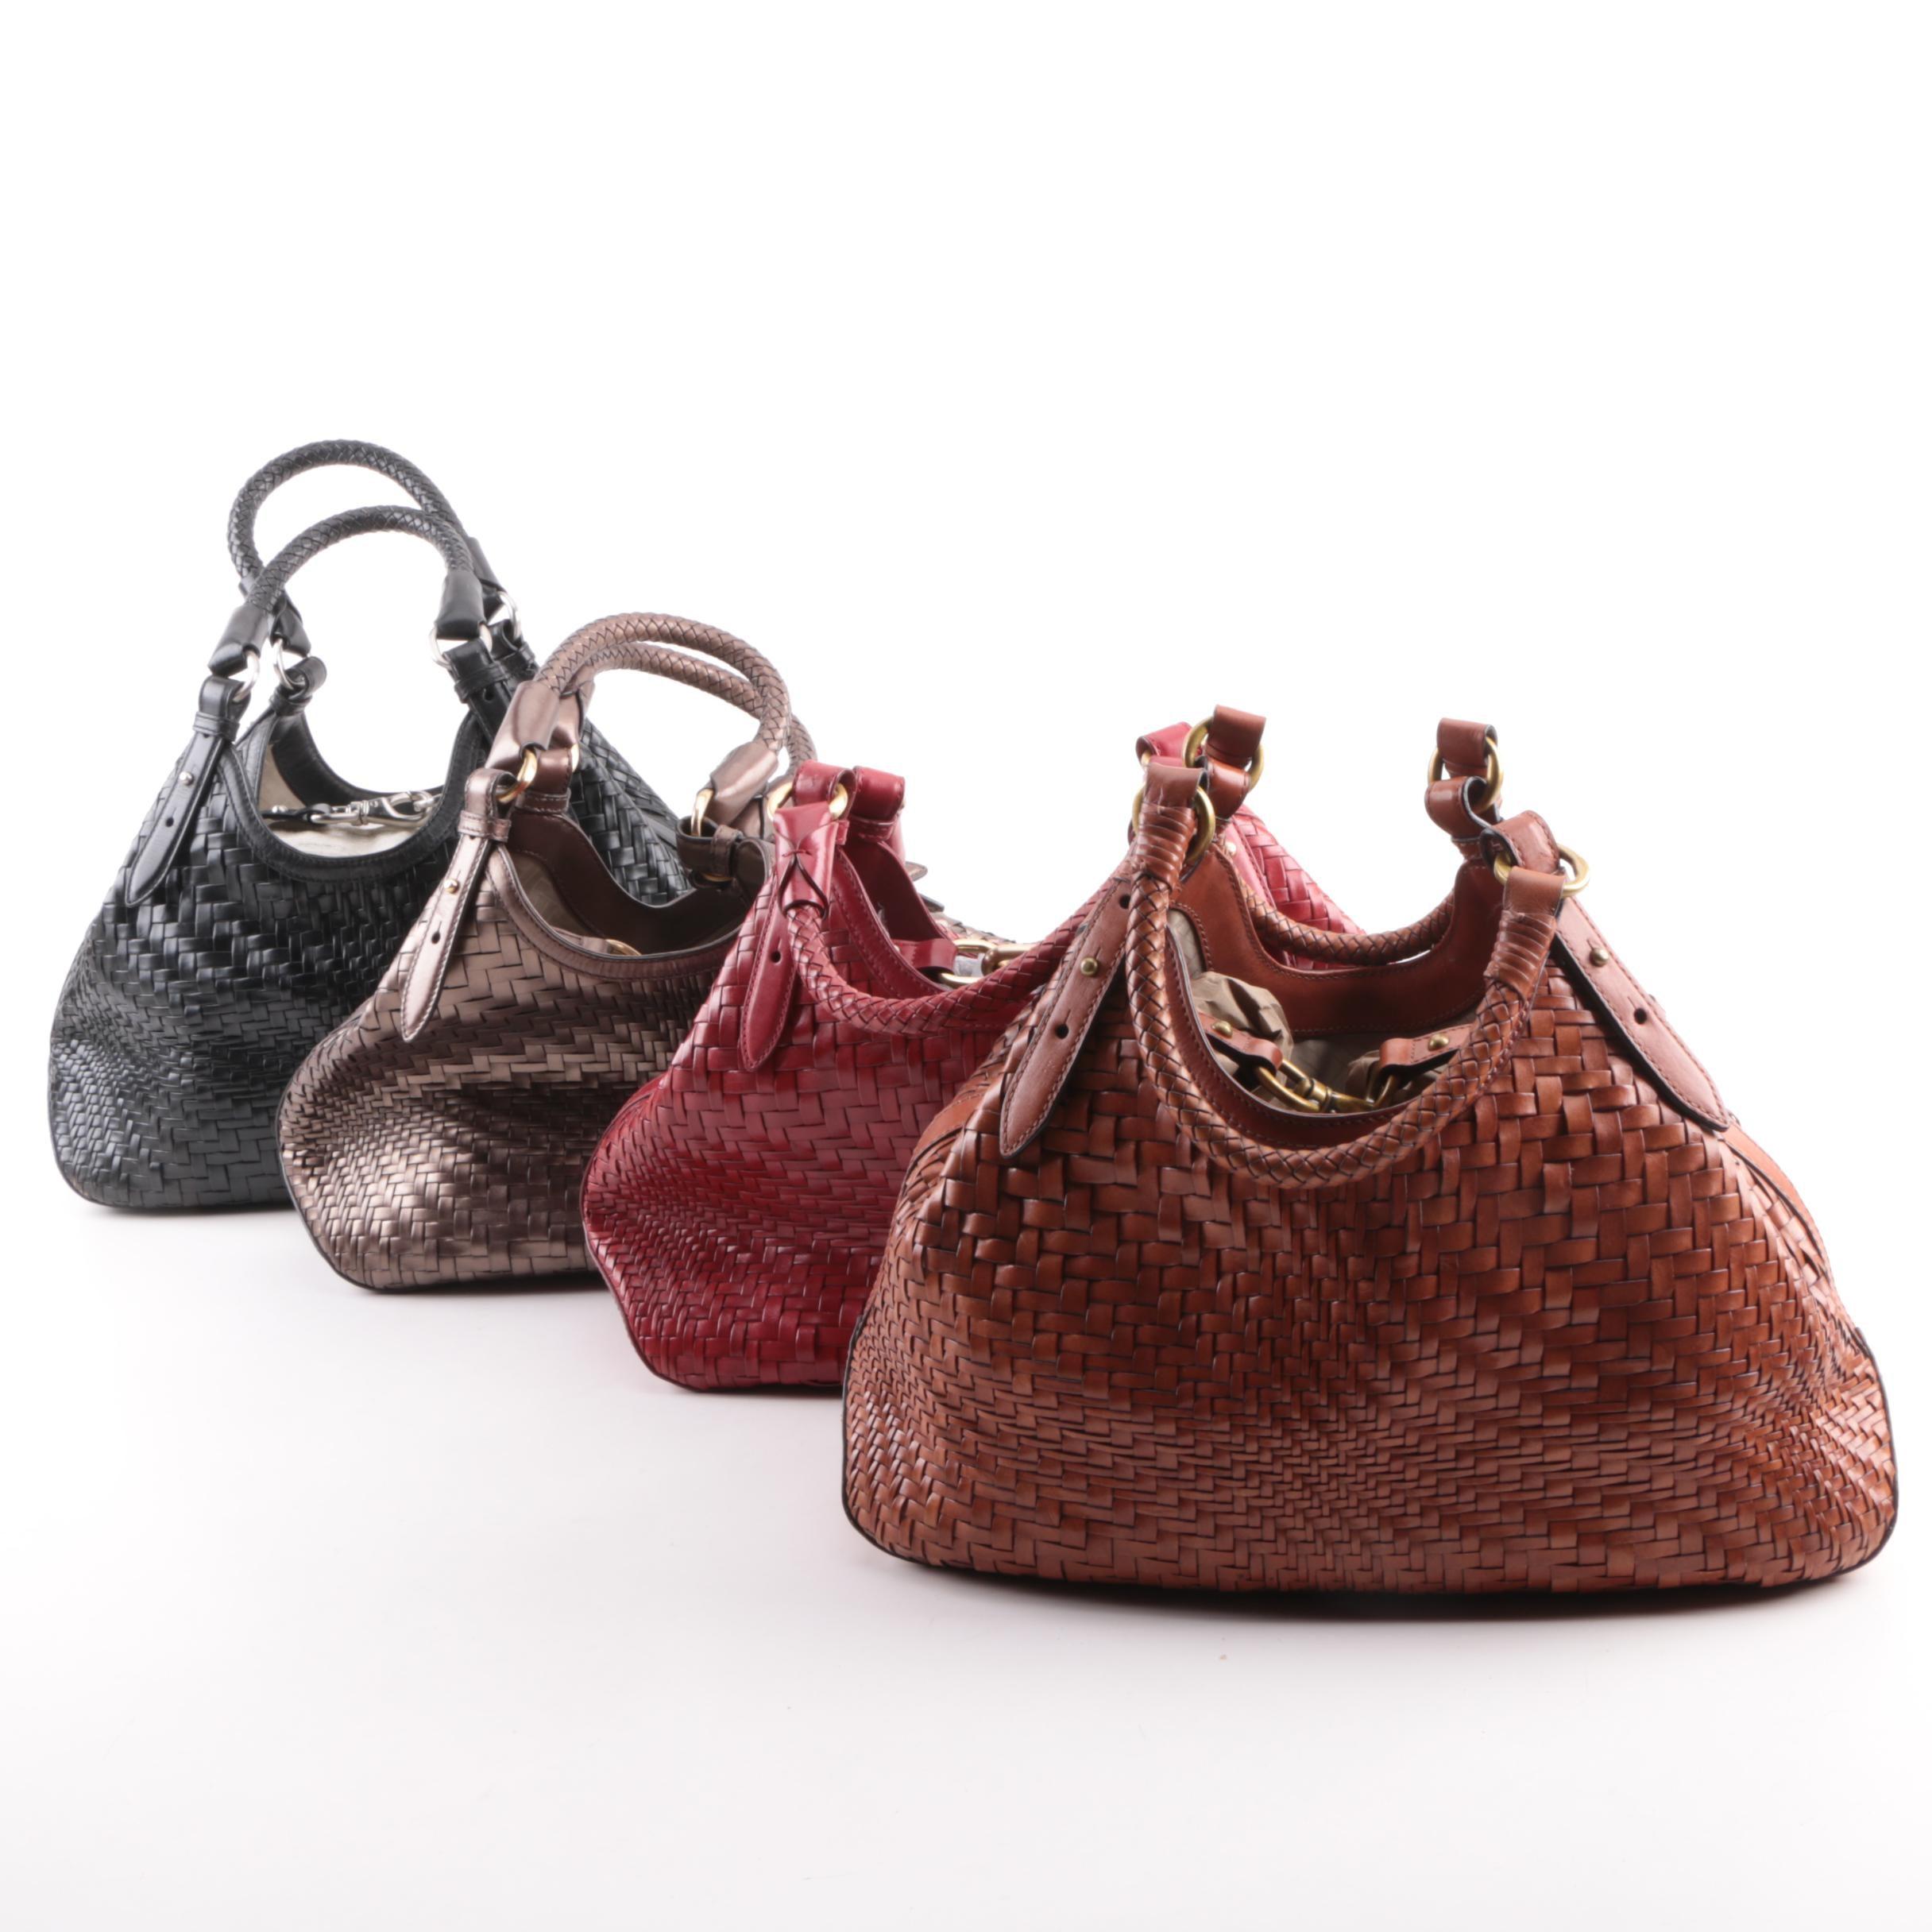 Cole Haan Woven Leather Handbags